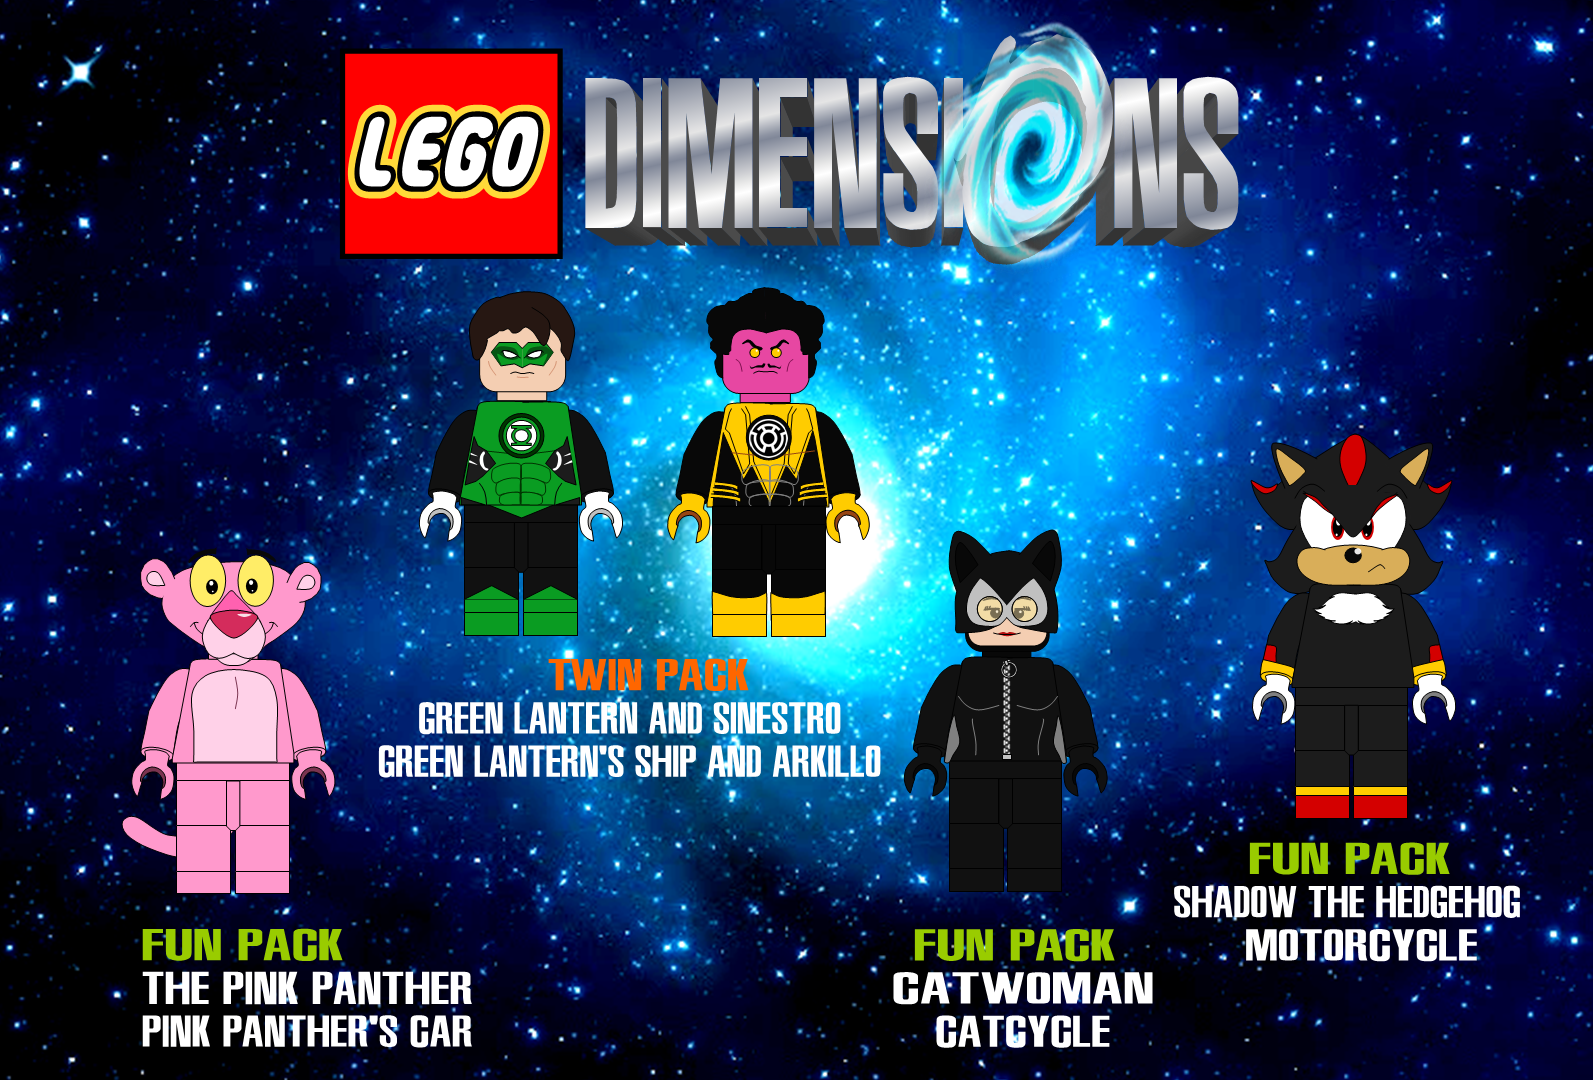 Quicksilver Avengers 2 Costume Lego Dimensions Wishli...